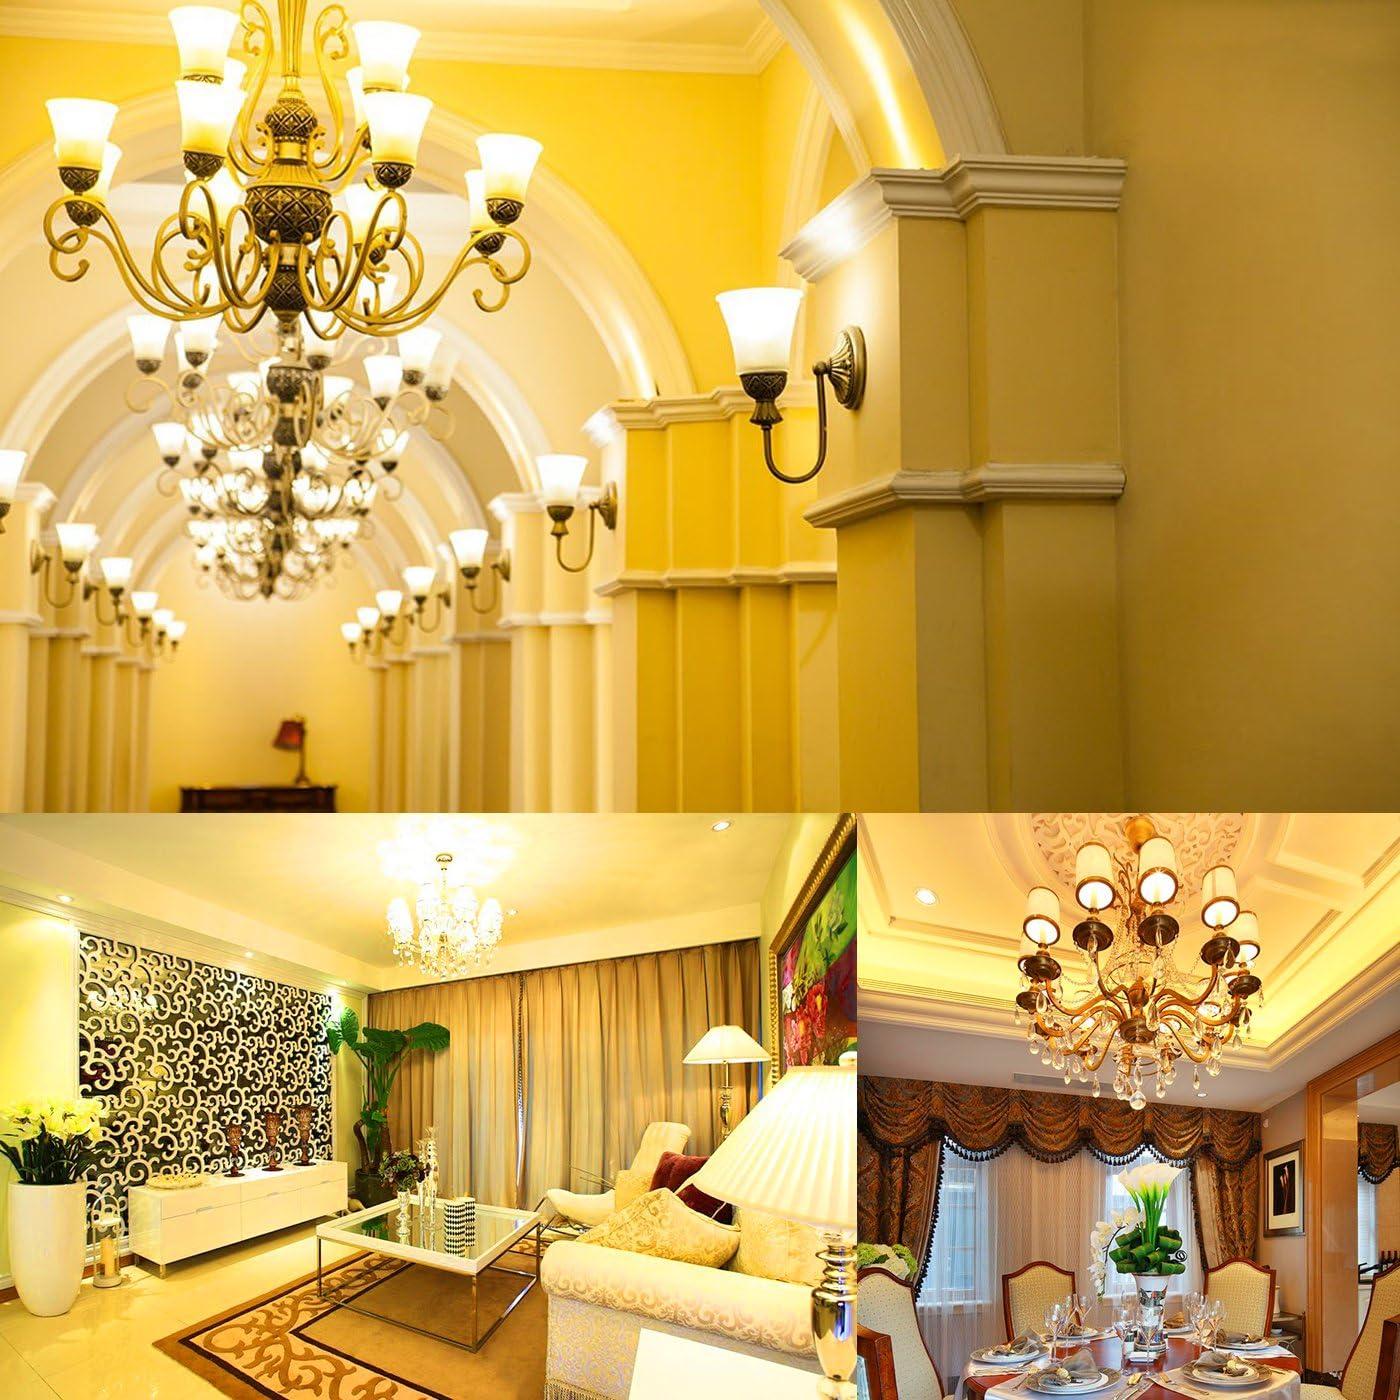 HzSane LED Corn Bulbs 1200 Lumens LED Lights E12 Base 3 Pack 12W Warm White 3000K LED Bulbs 100 Watt Incandescent Bulbs Equivalent Cylinder Bulbs